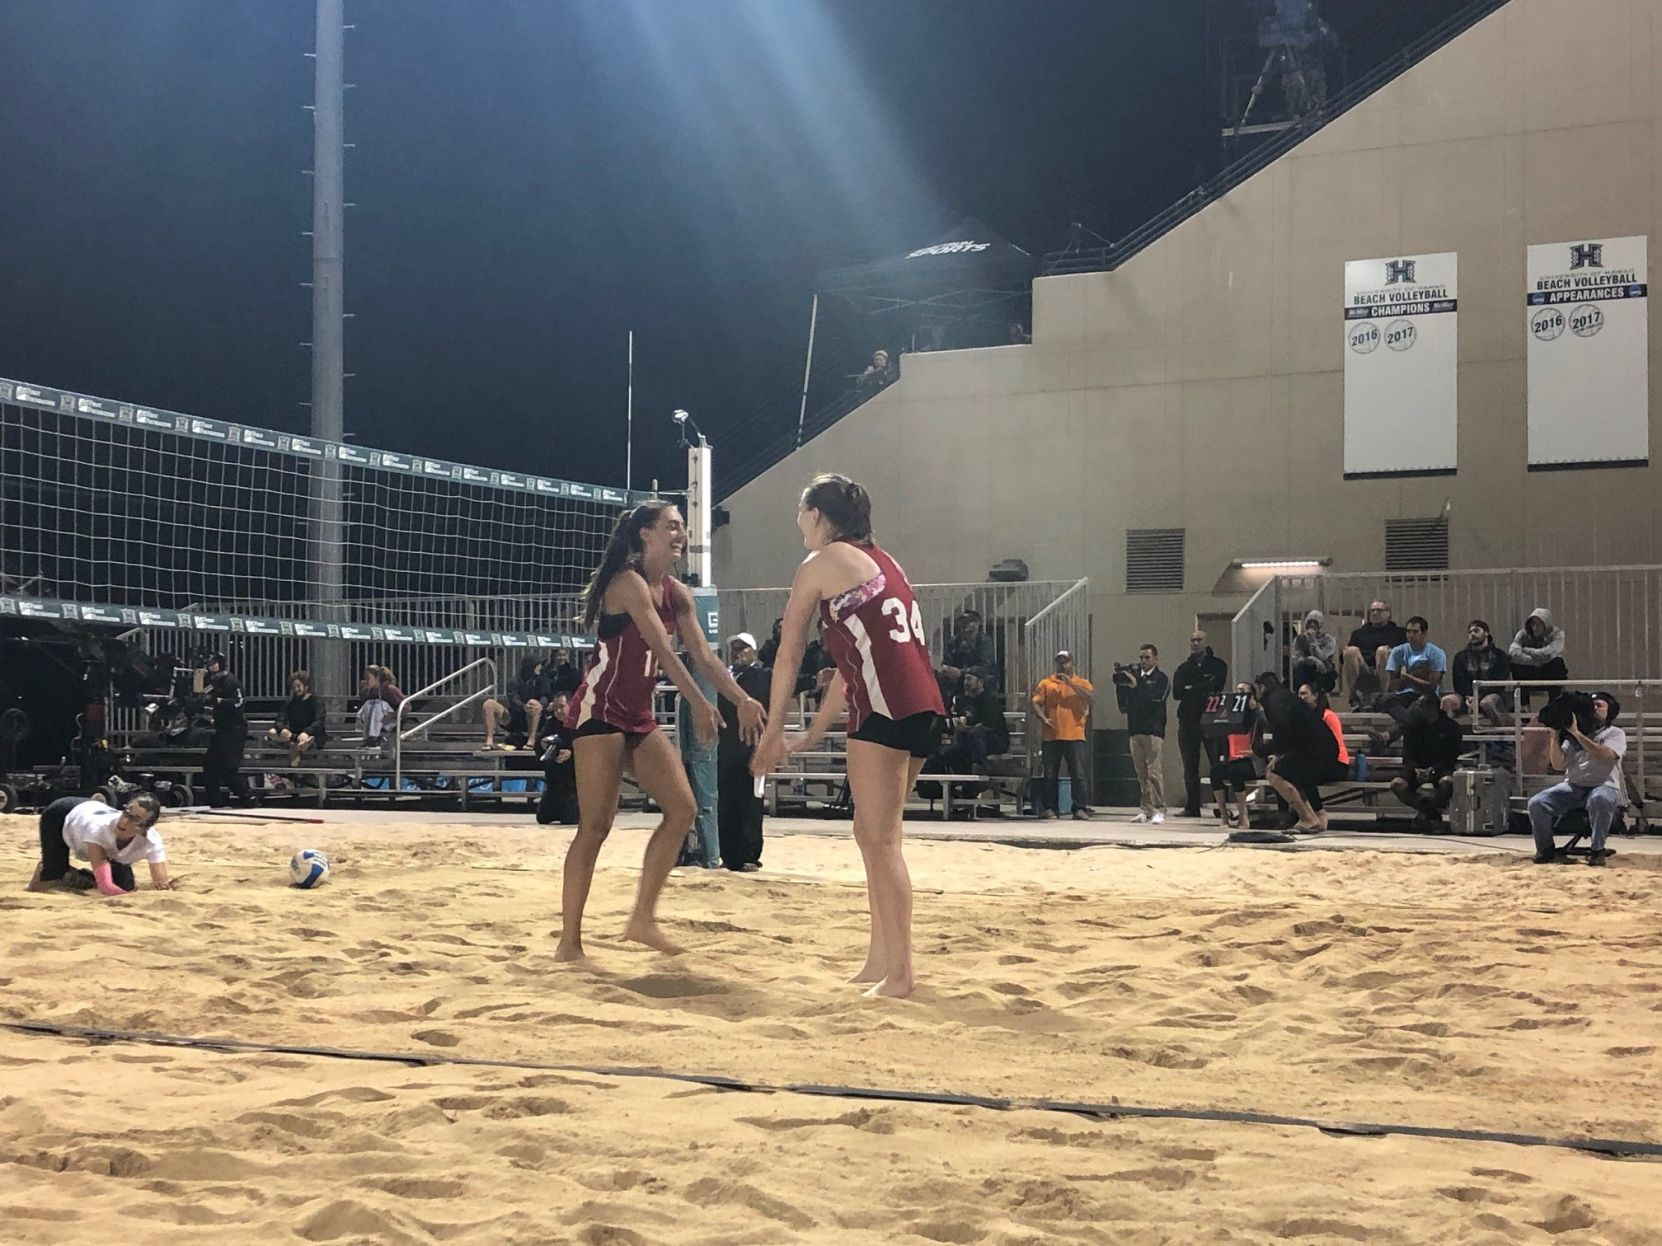 NU Hawaii beach volleyball 3 Albrecht Maloney have